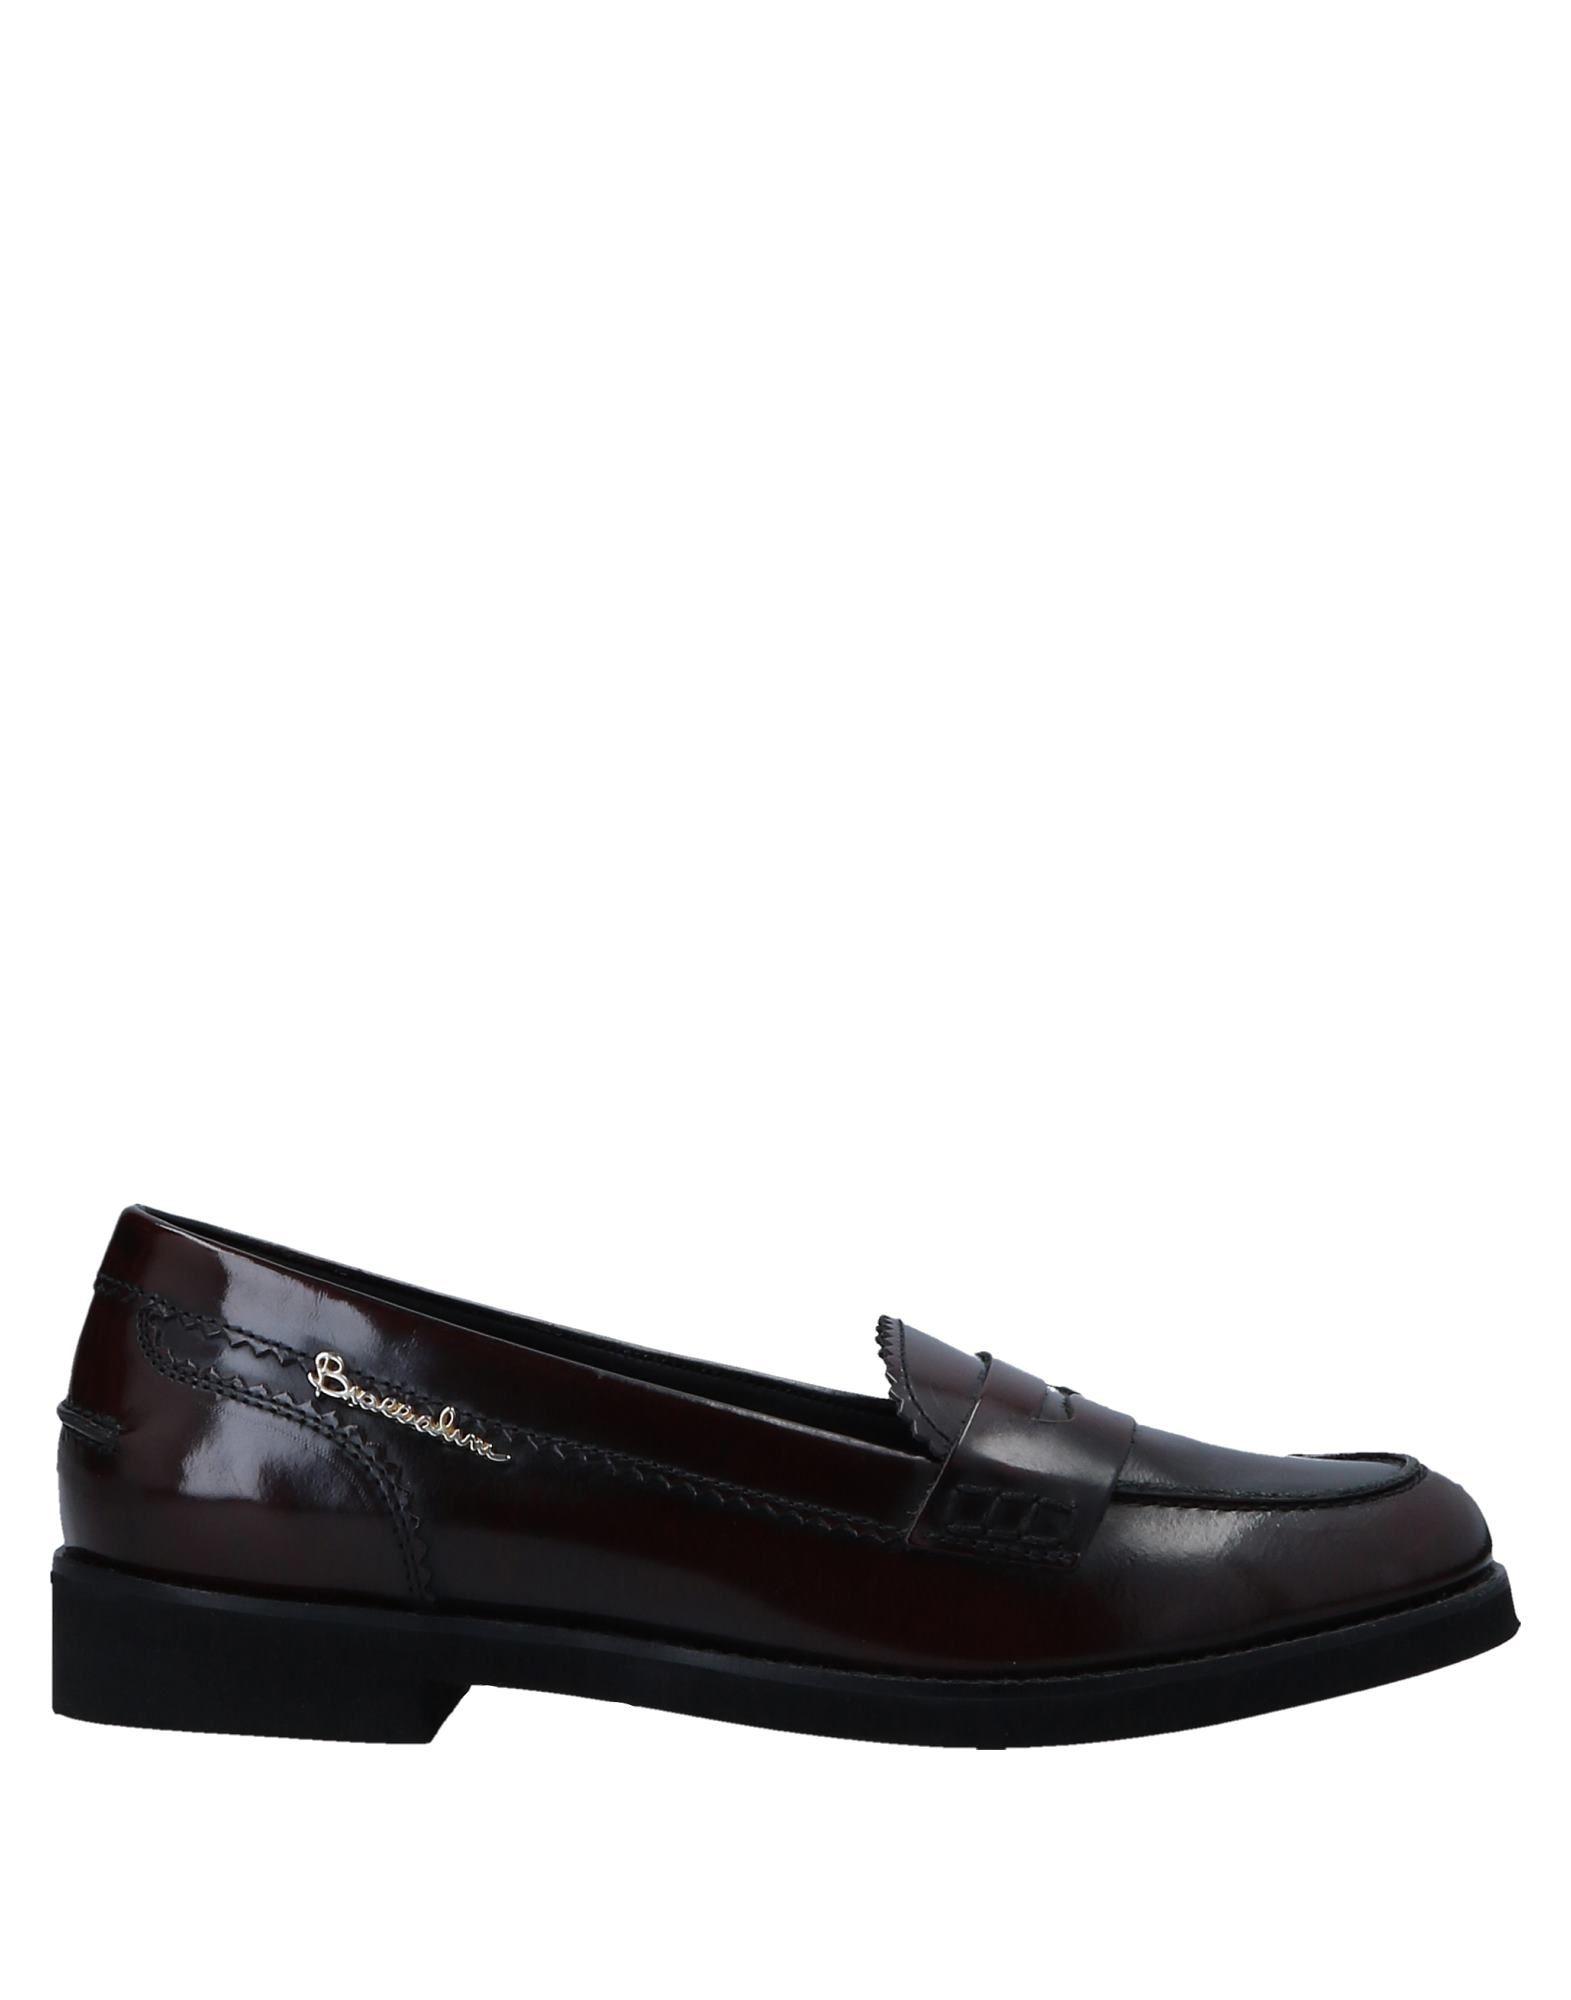 Braccialini 11555151SH Mokassins Damen  11555151SH Braccialini Gute Qualität beliebte Schuhe 3c1743